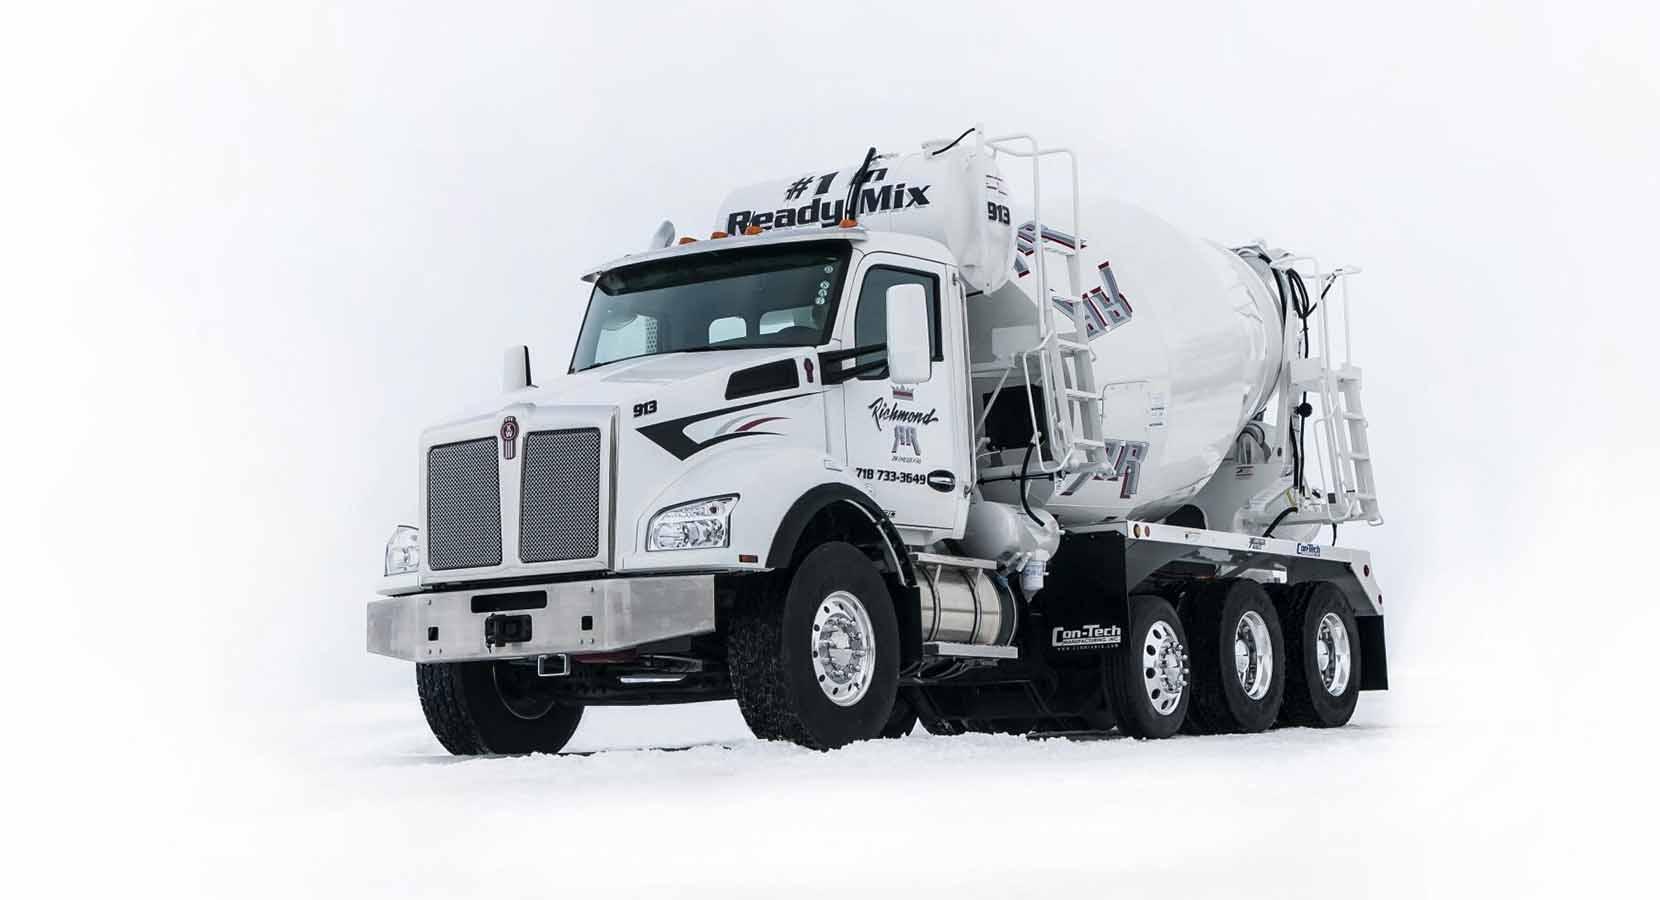 Concrete Supply Company Staten Island Ny Richmond Ready Mix